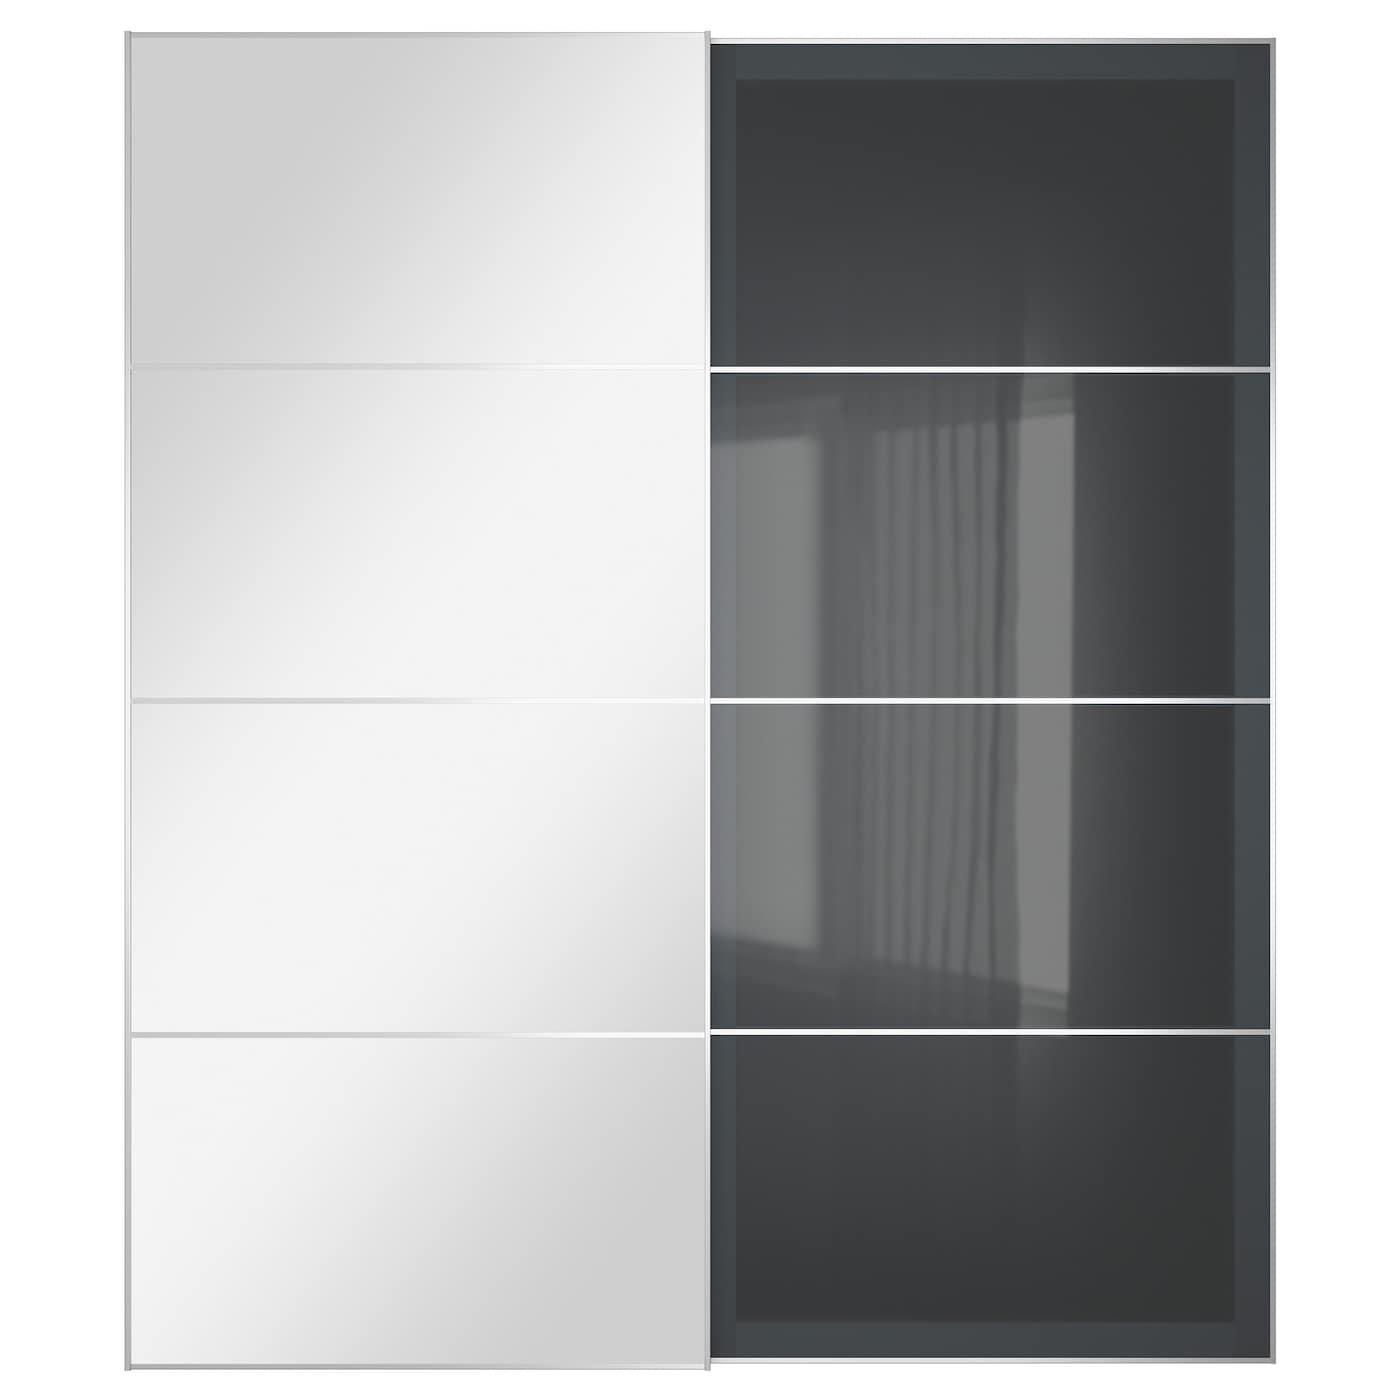 UGGDAL AULI Pair of sliding doors Mirror glass grey glass